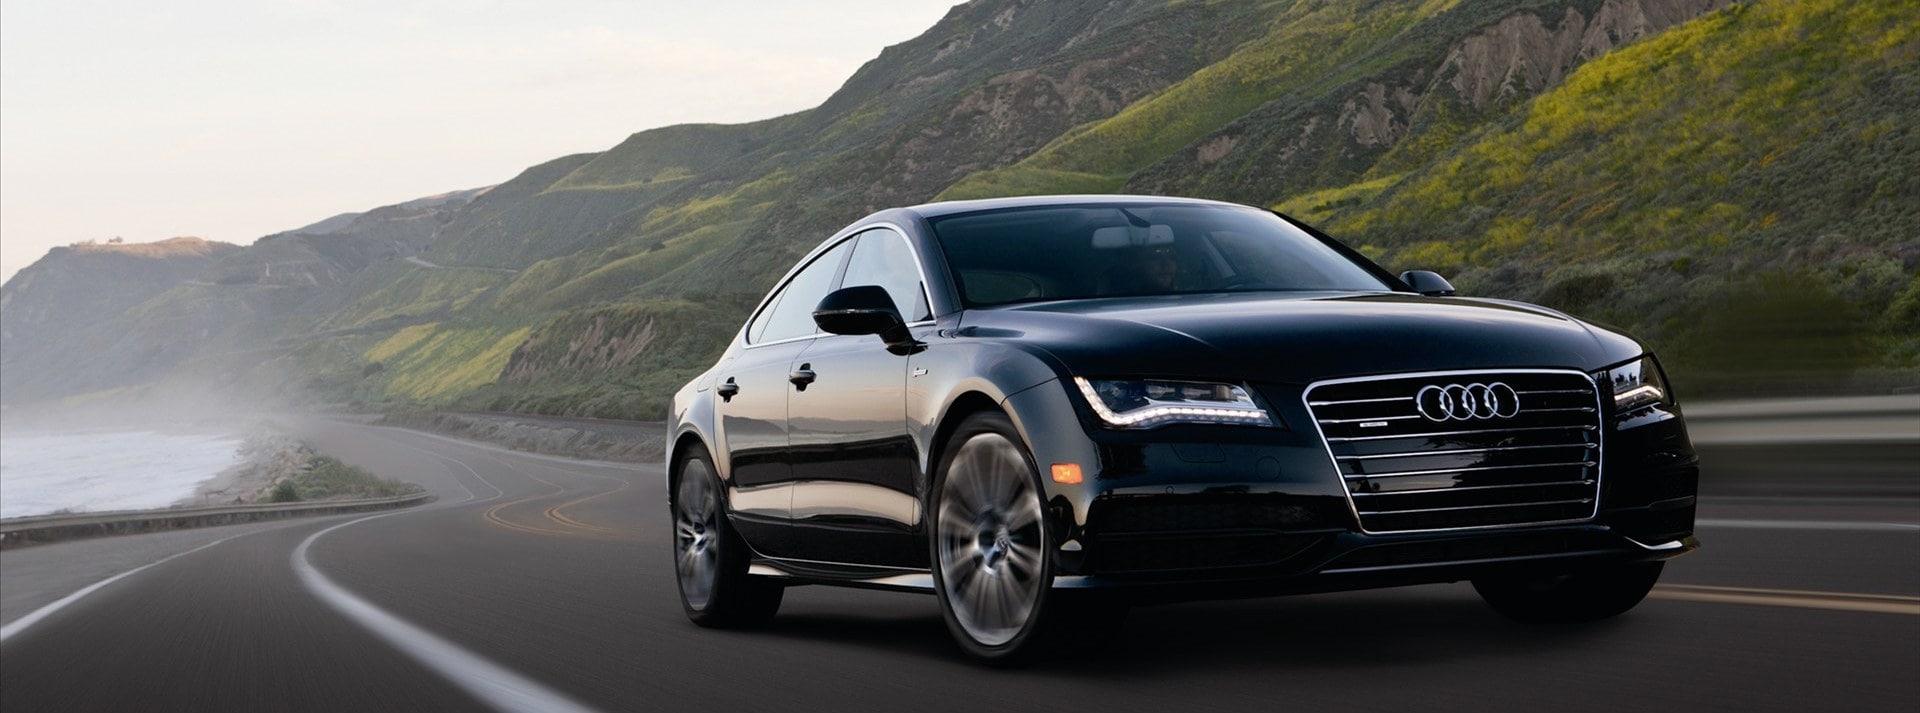 Edmunds Car Appraisal >> Audi Edmunds Car Value In Columbia Sc Audi Columbia